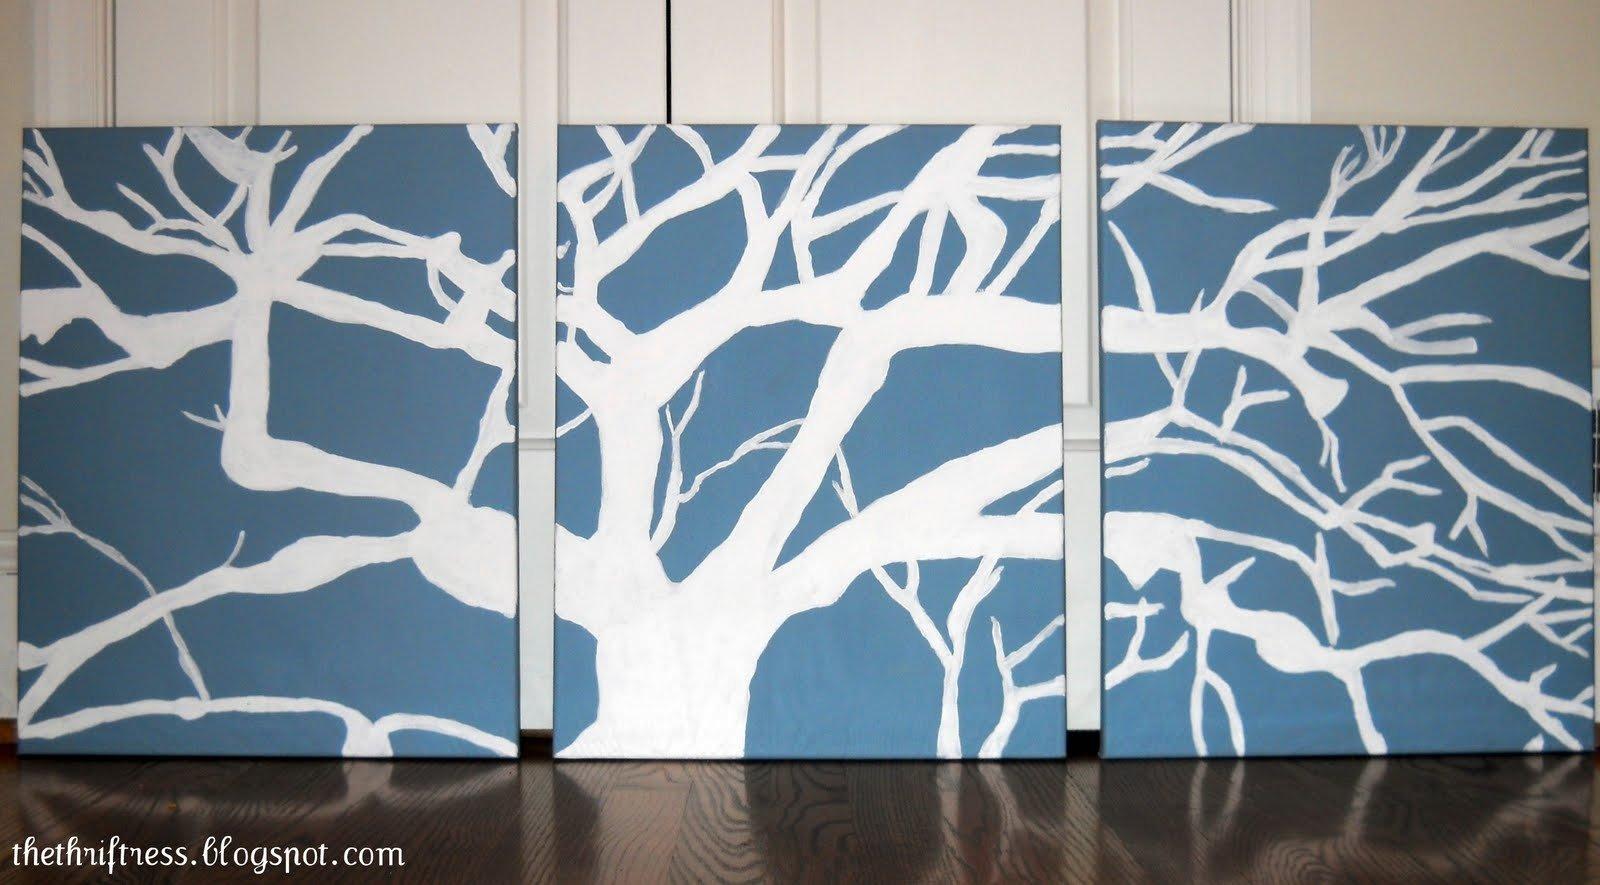 10 Fantastic Diy Canvas Wall Art Ideas diy canvas wall art ideas stencils paint tierra este 28929 2020